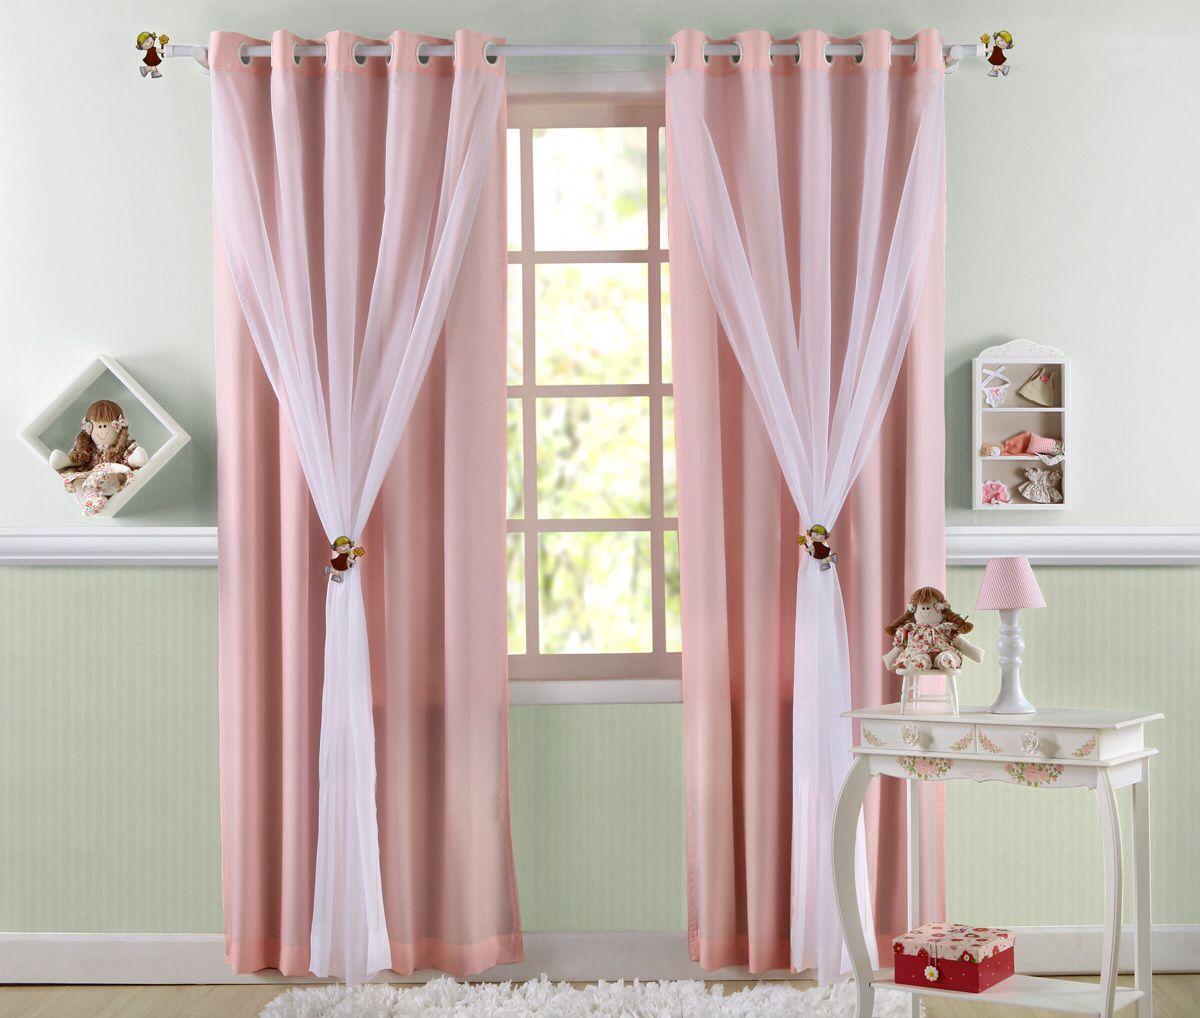 Cortina Infantil Rosa  Belchior Cortinas e Acessrios Ltda  Curtains Drapes curtains e Curtains with blinds